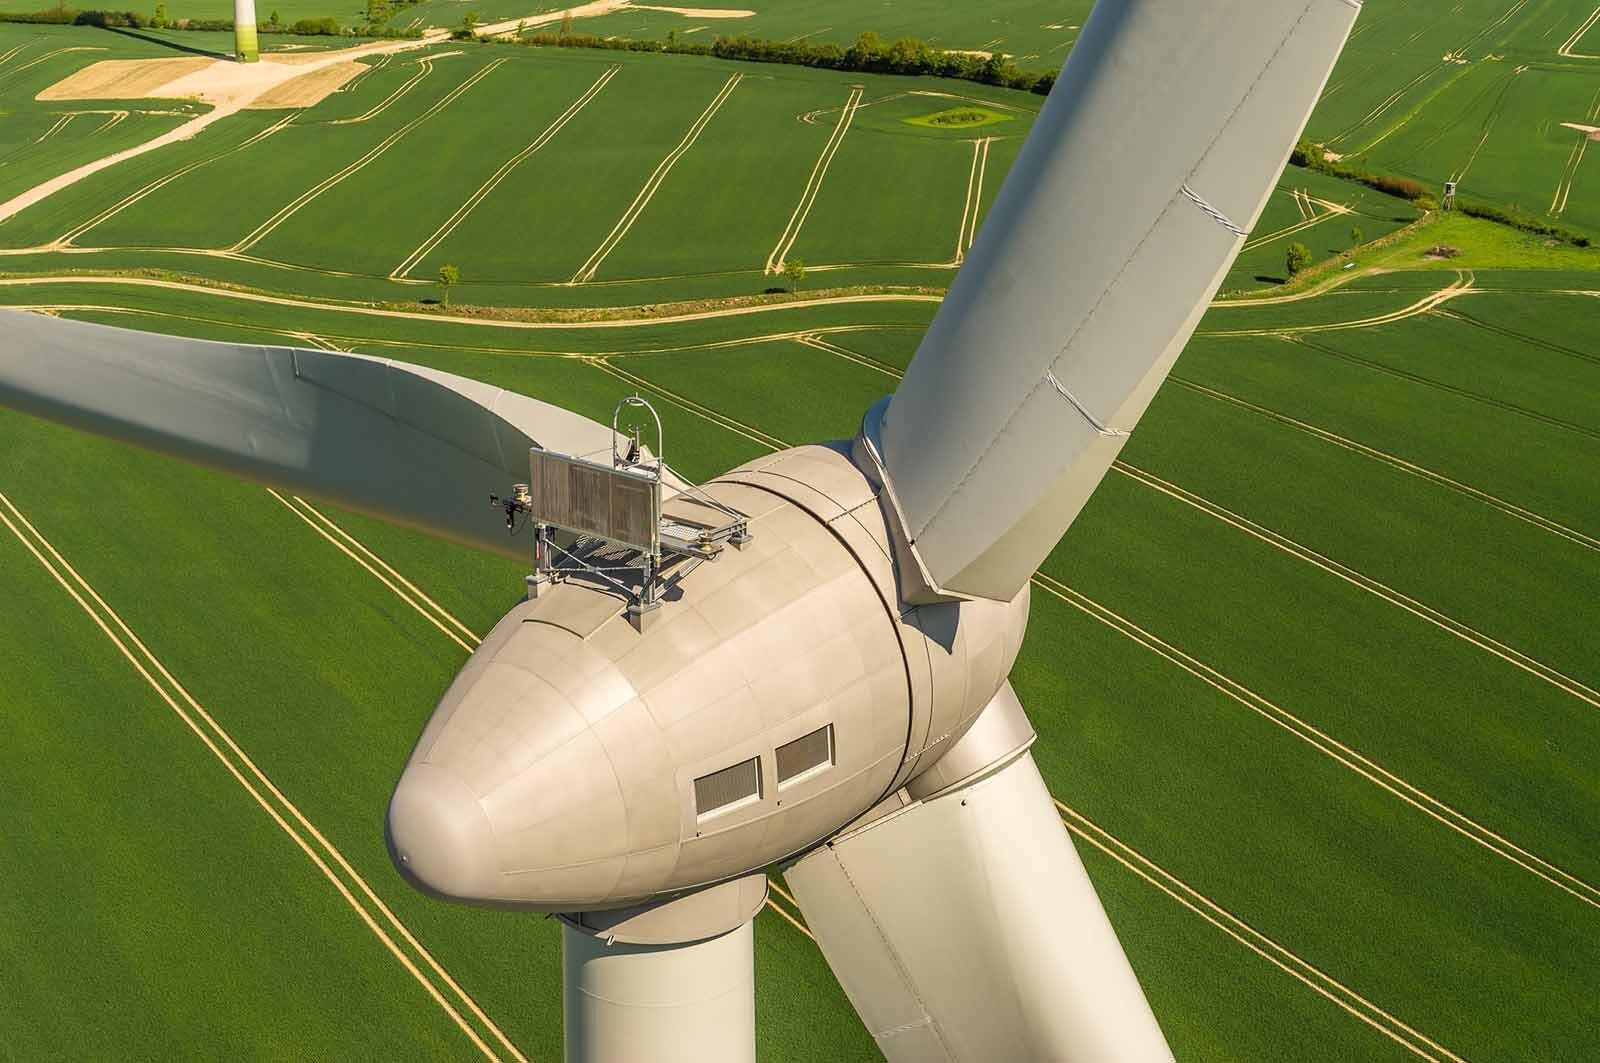 wind turbine materials